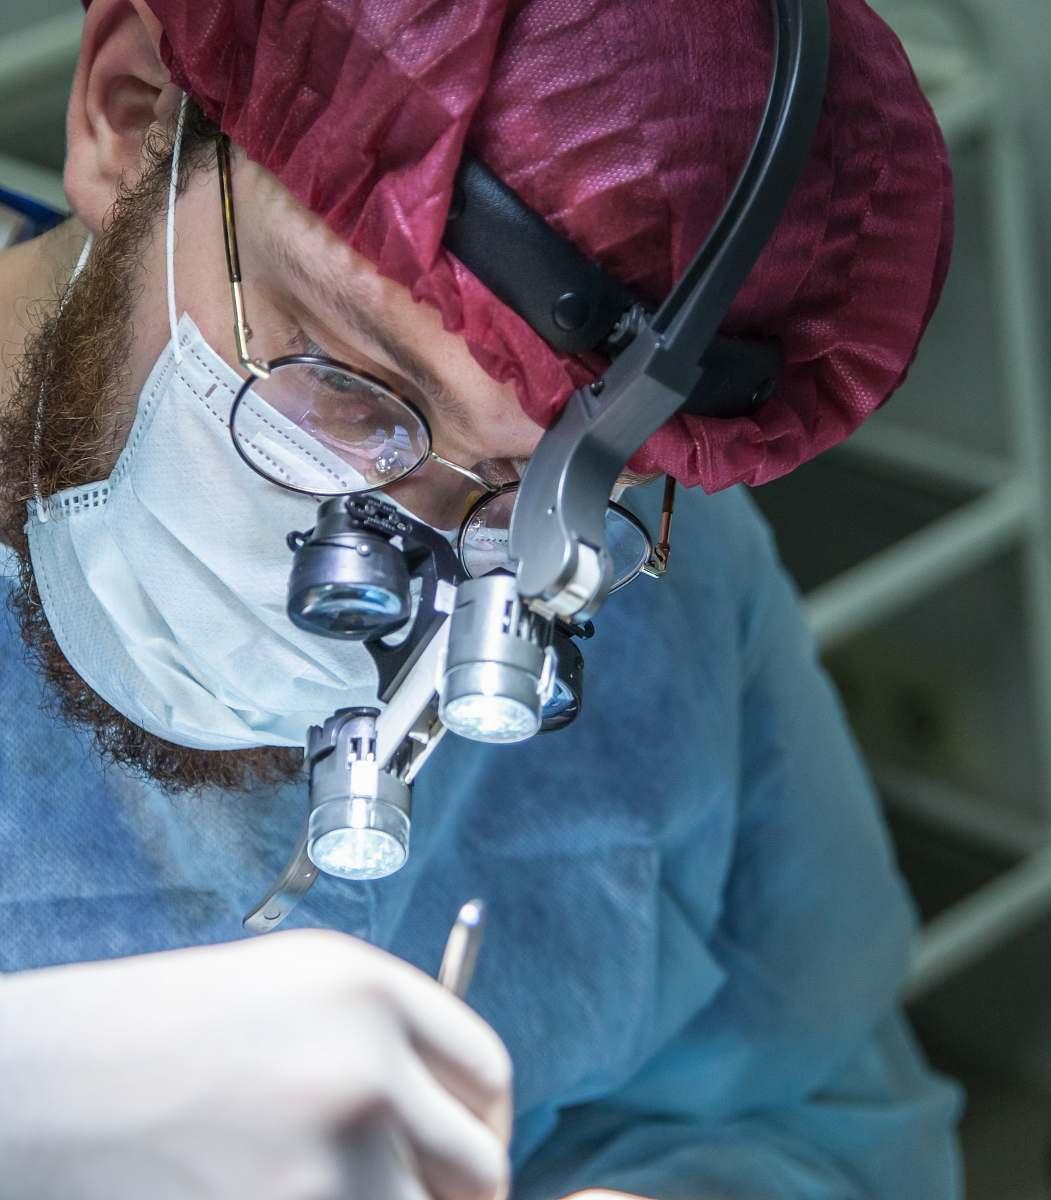 Surgeon Man Wearing Head Microscope Clinic Image - Free ...